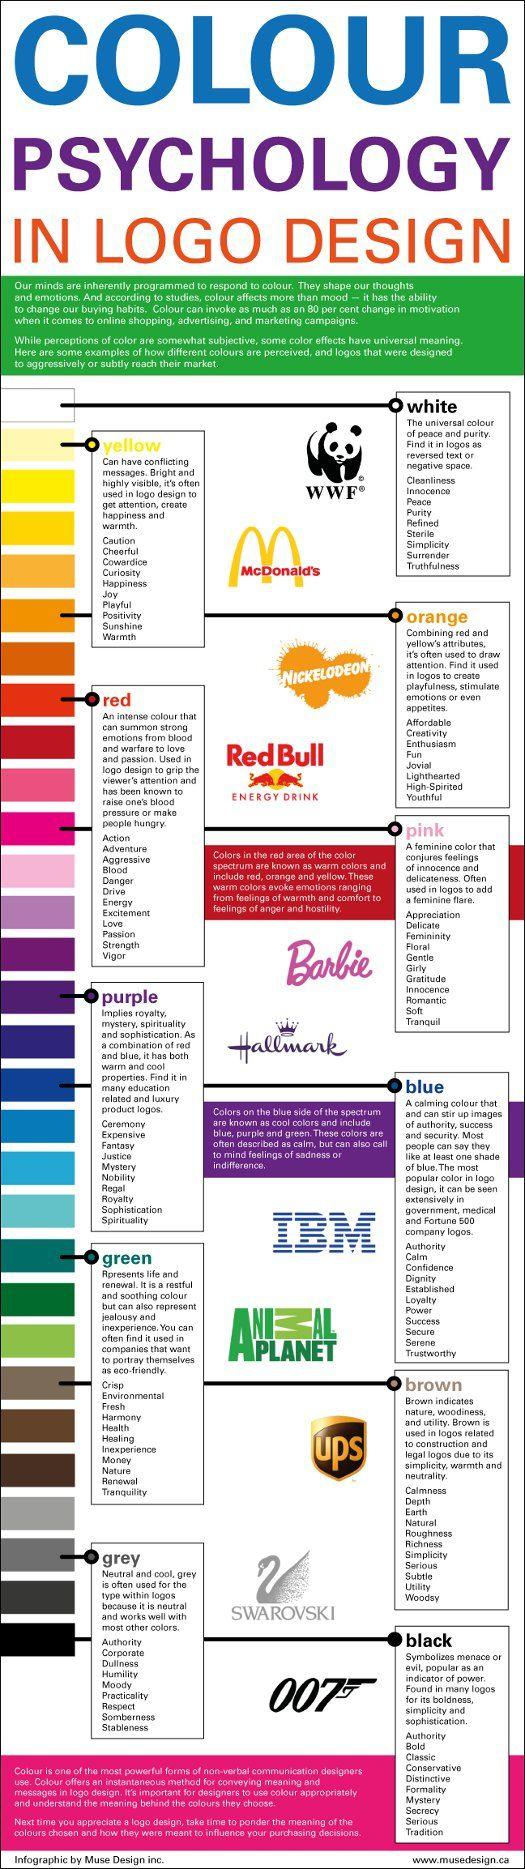 colour psychology in logo design – Vanessa Kestering